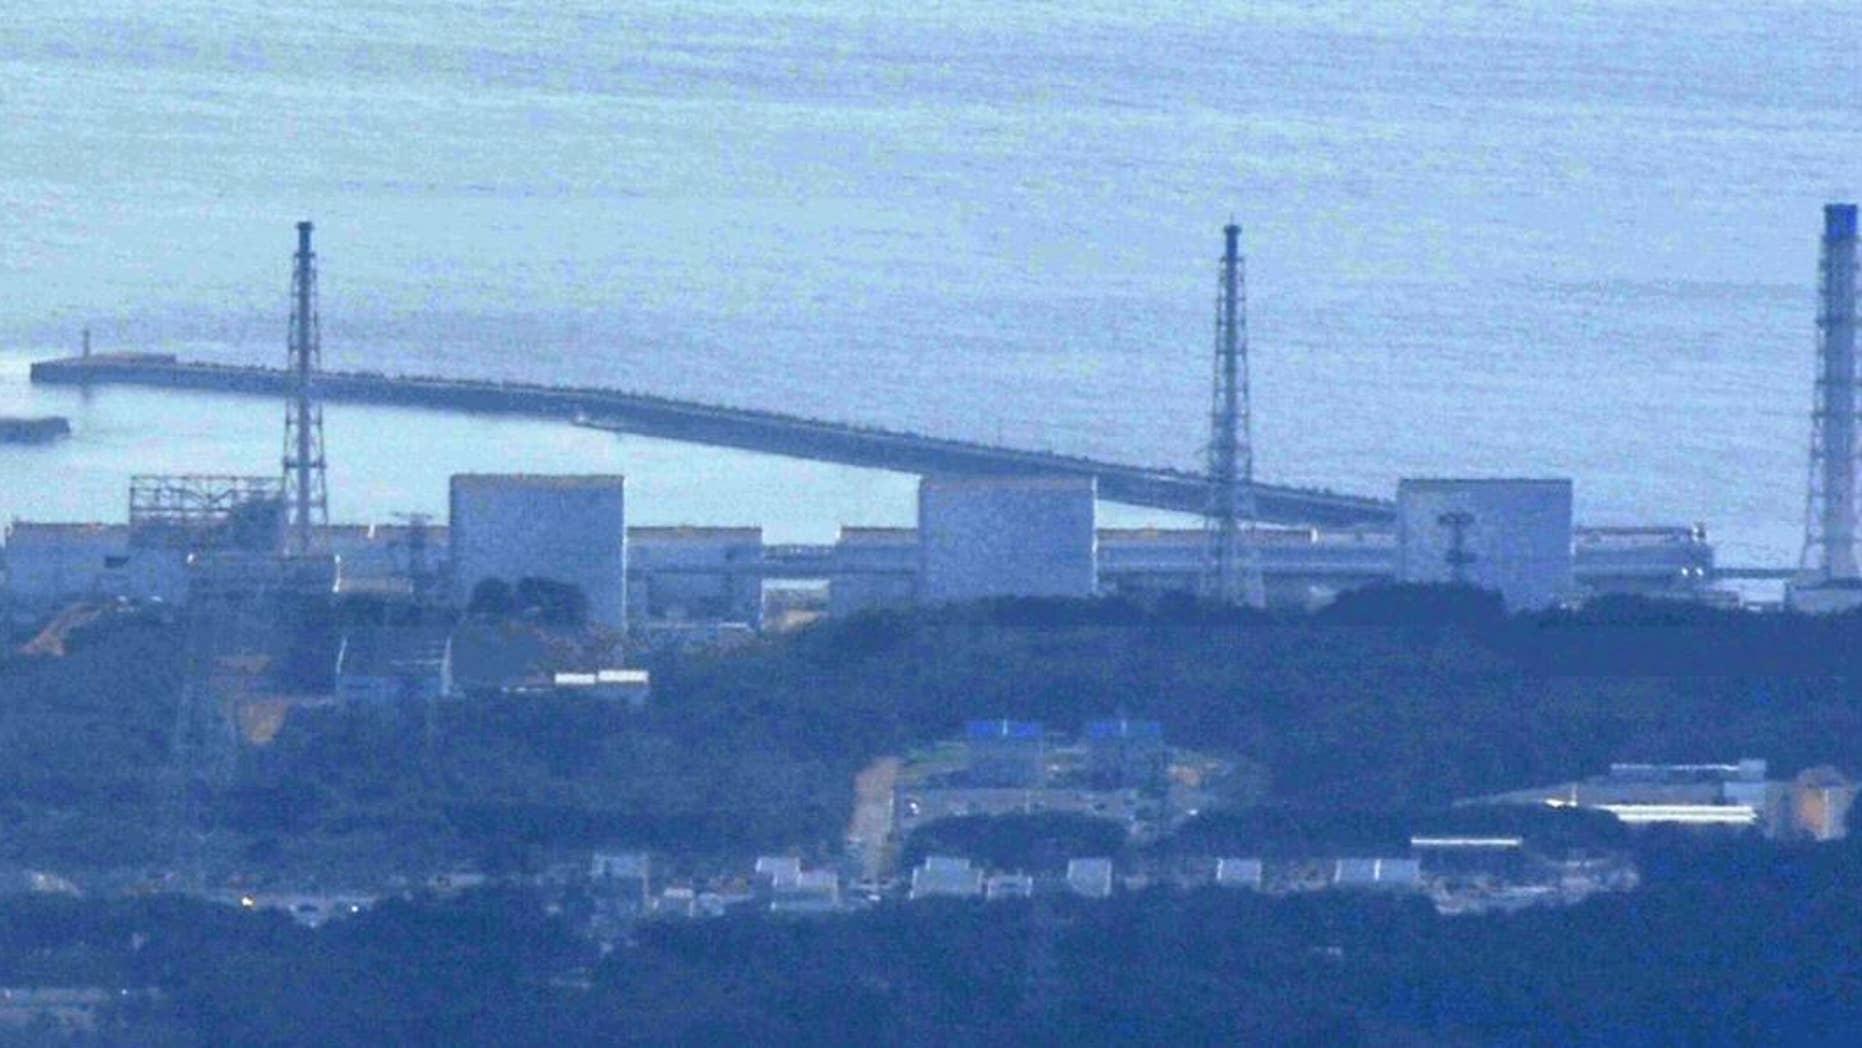 The damaged Fukushima Daiichi Nuclear Power Plant  (AP Photo/Kyodo News)